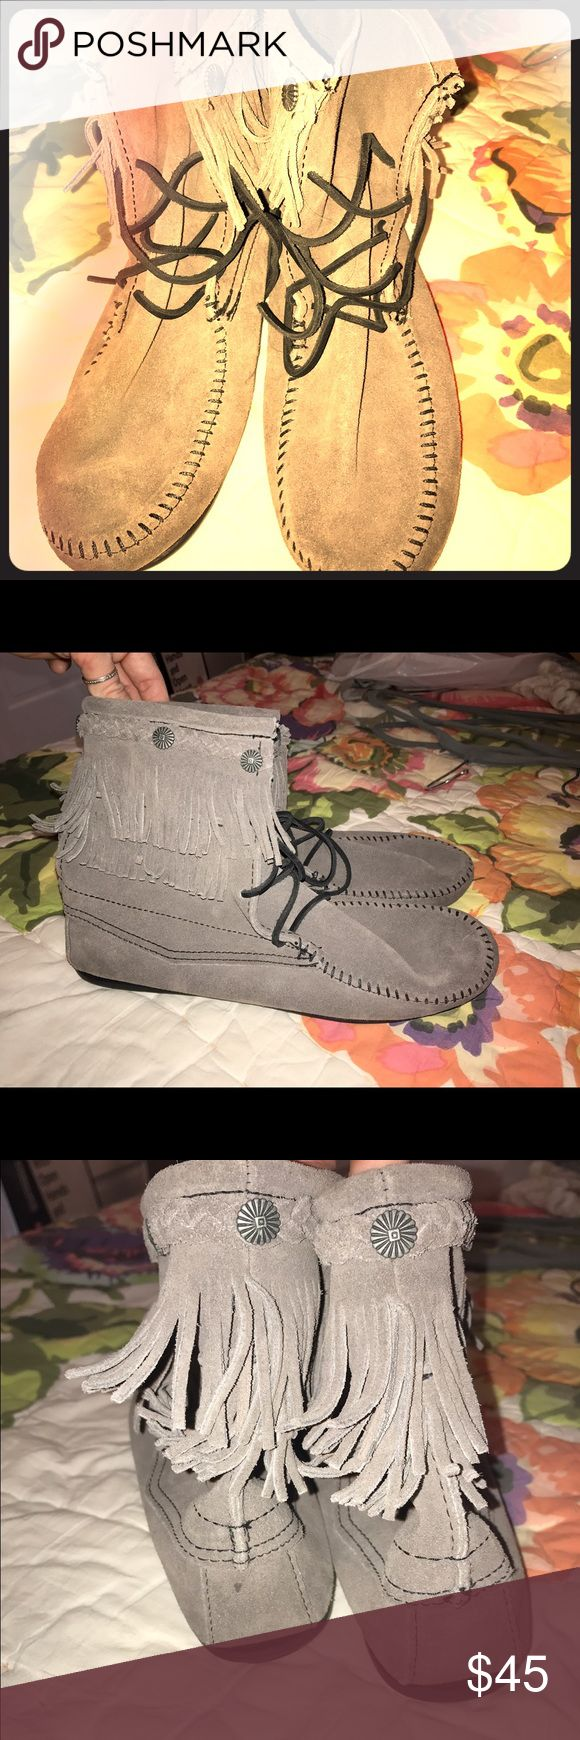 Gray Minnetonka fringe ankle boots Gray Minnetonka fringe ankle boots. Never been worn. US Size 10. Minnetonka Shoes Ankle Boots & Booties